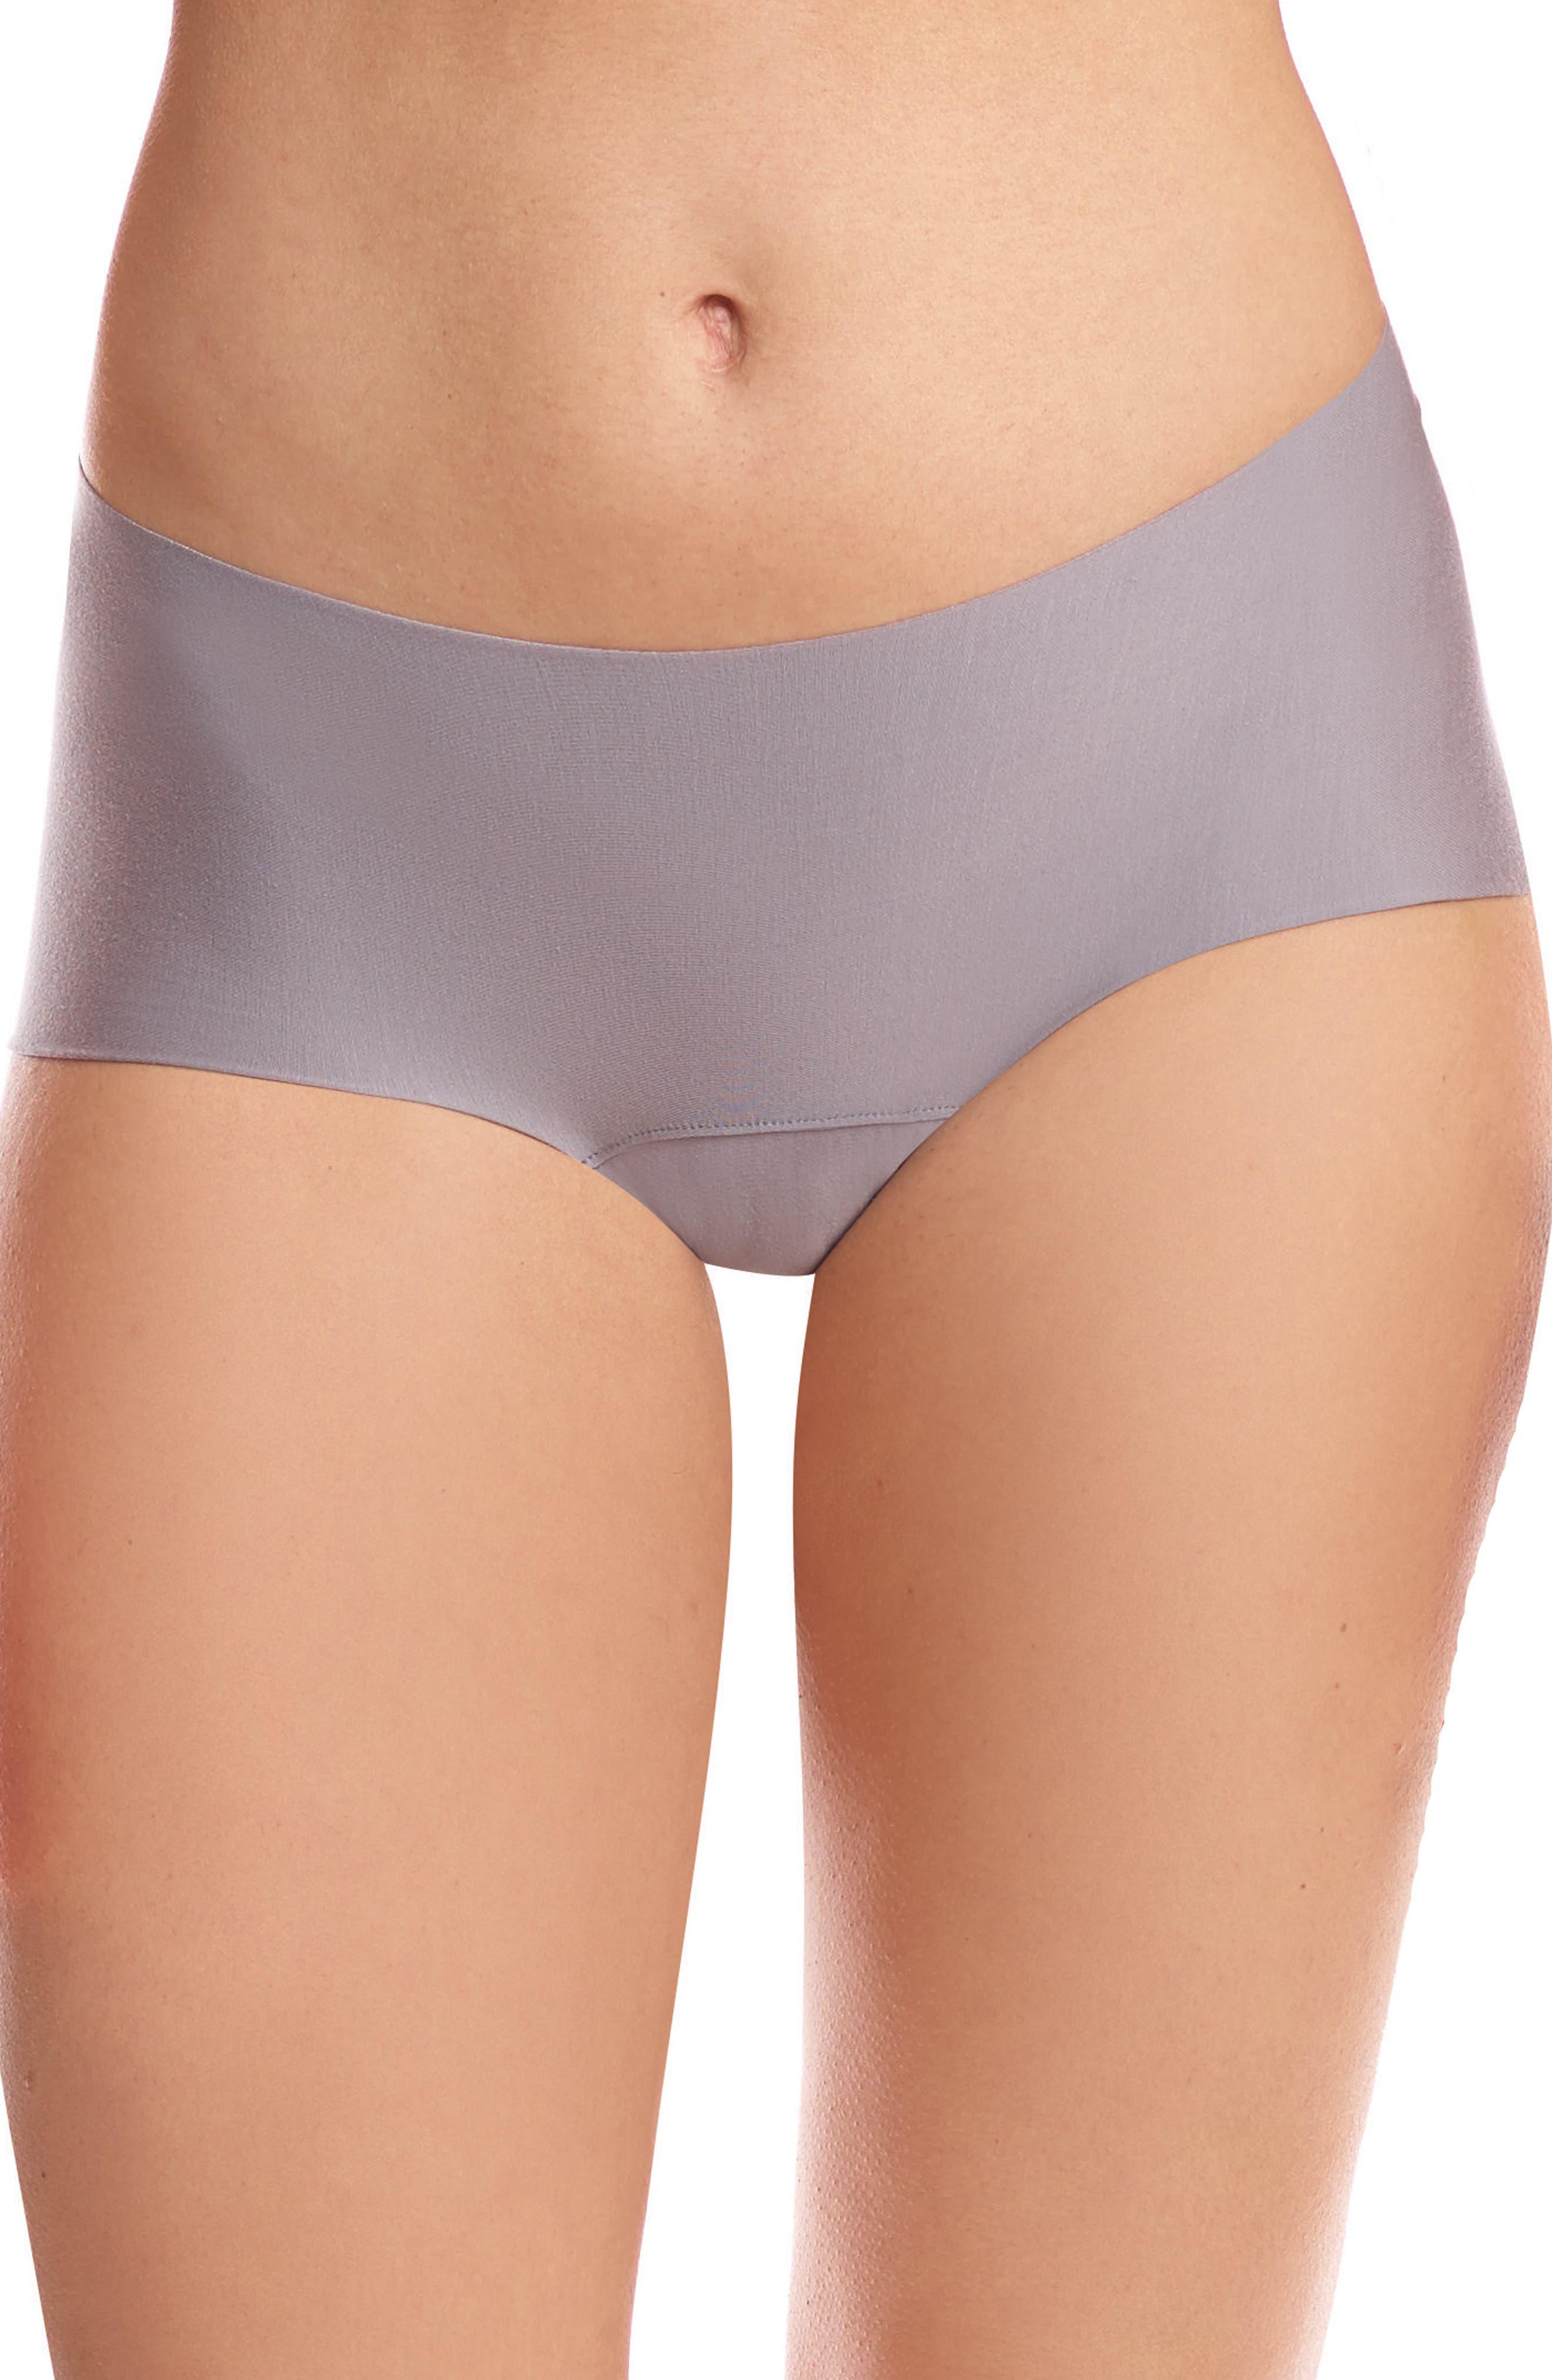 Butter Seamless Hipster Panties,                         Main,                         color,